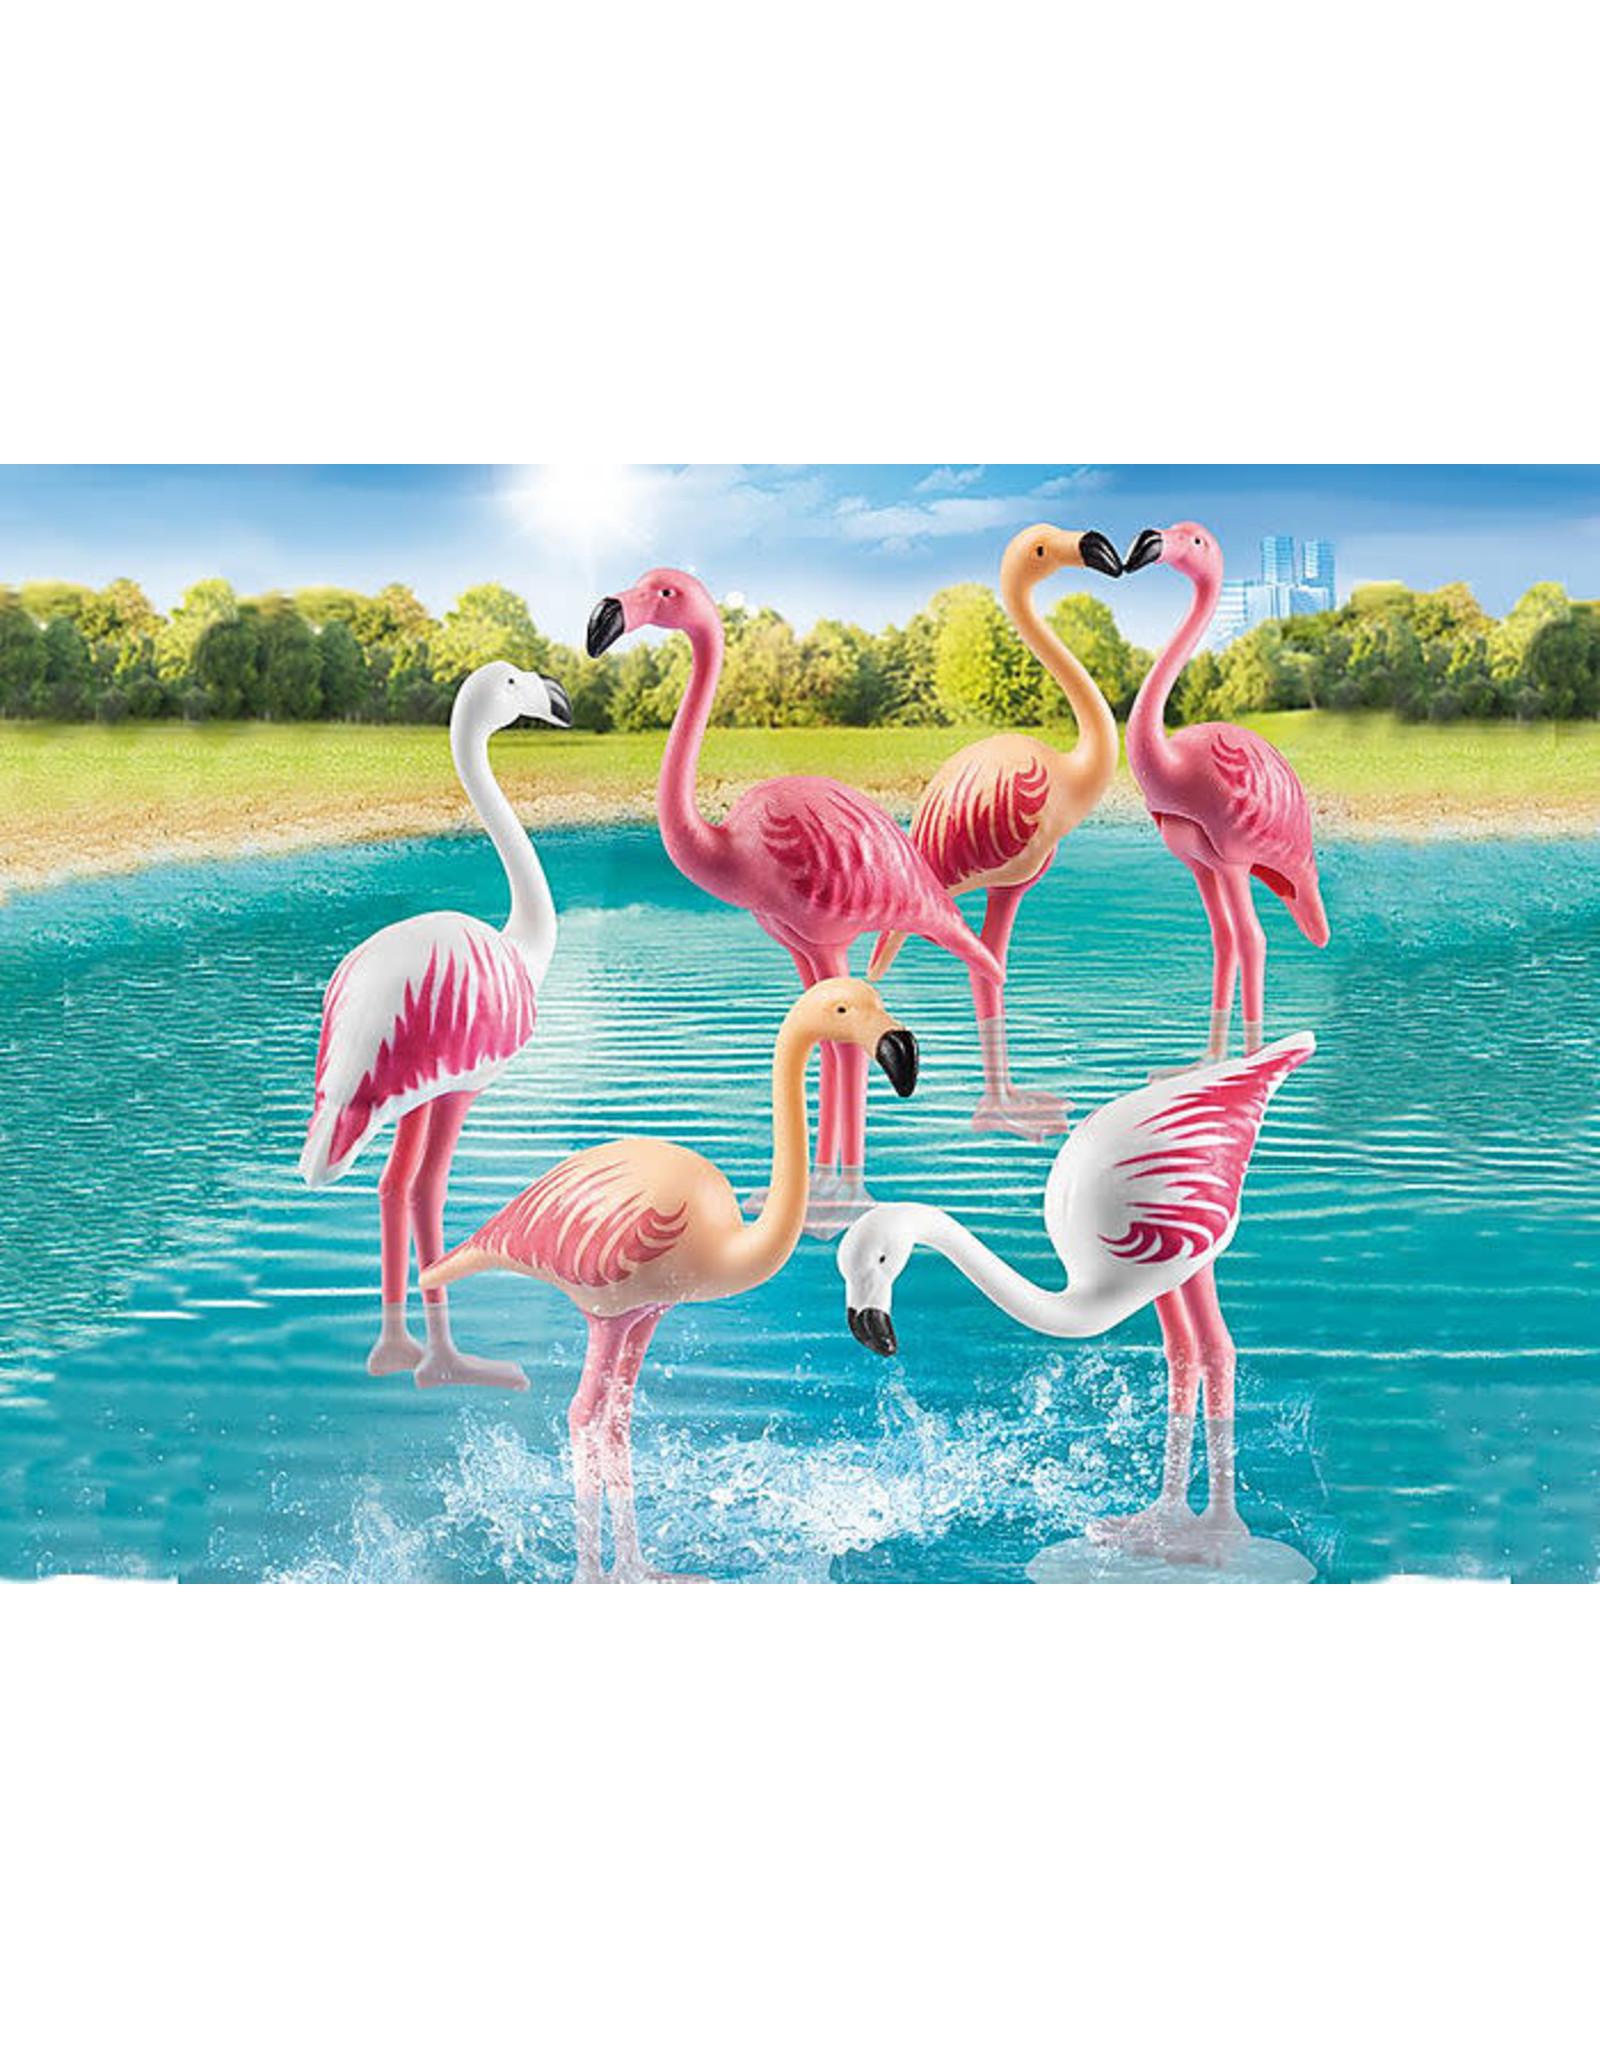 Playmobil Flock of Flamingos